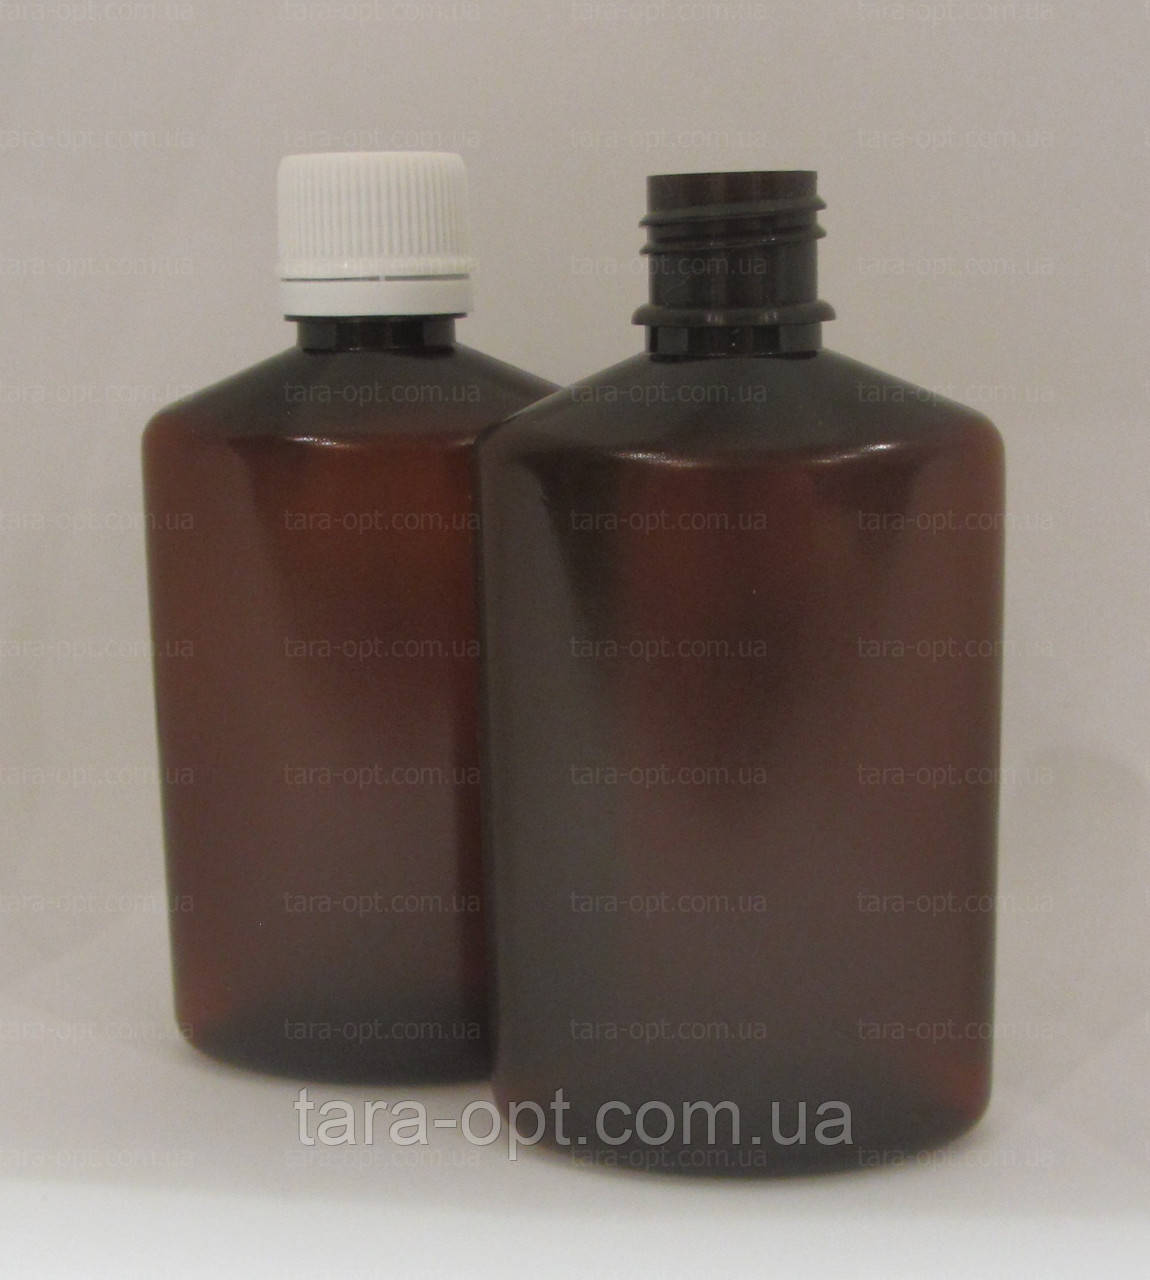 Бутылочки темные 100 мл с крышкой, (Цена от 3,25 грн)*